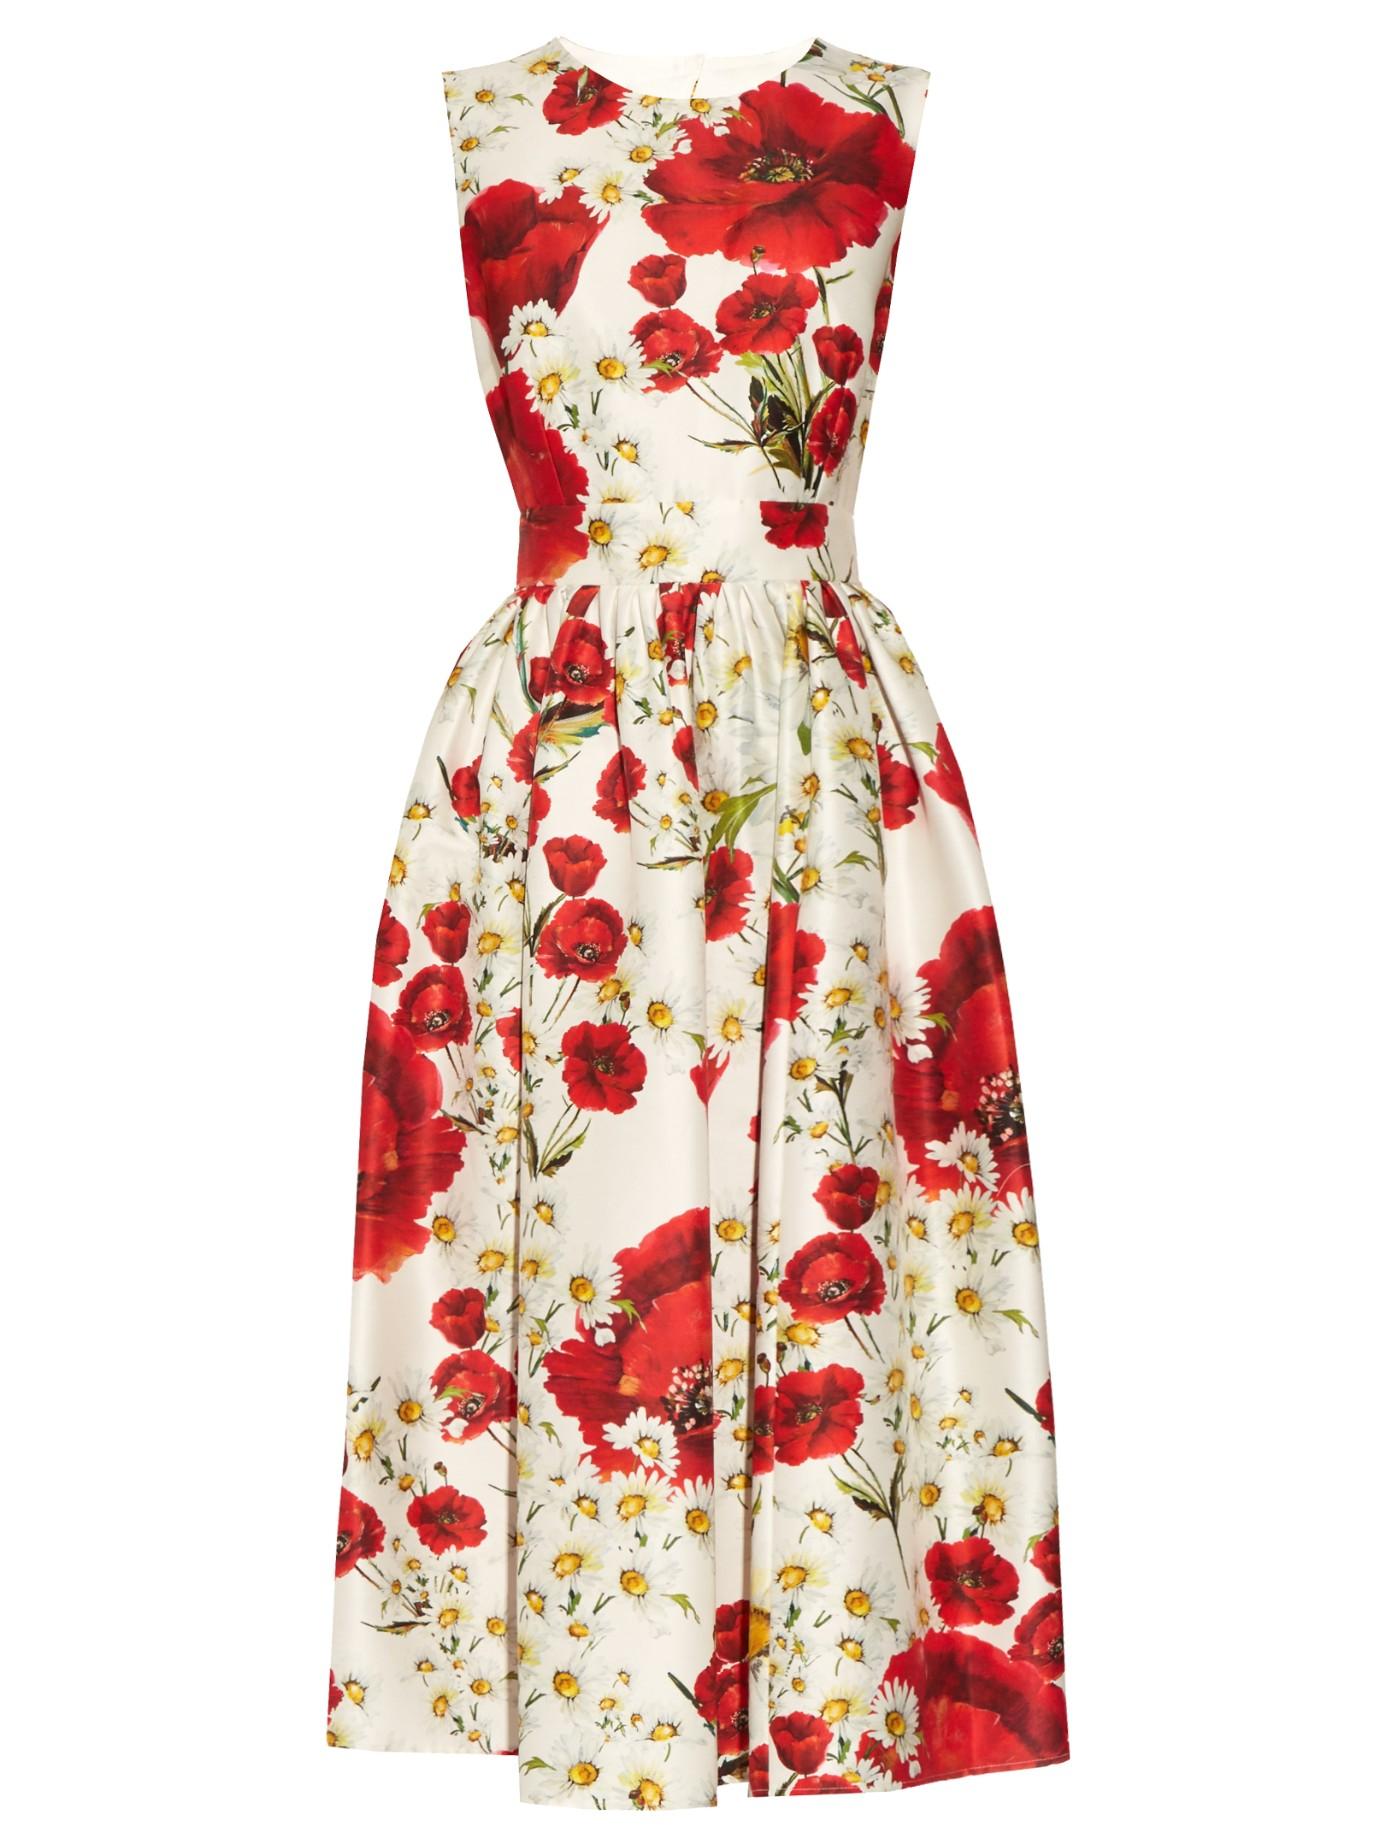 ee3c5646 Dolce & Gabbana Poppy-print Cotton And Silk-blend Dress - Lyst